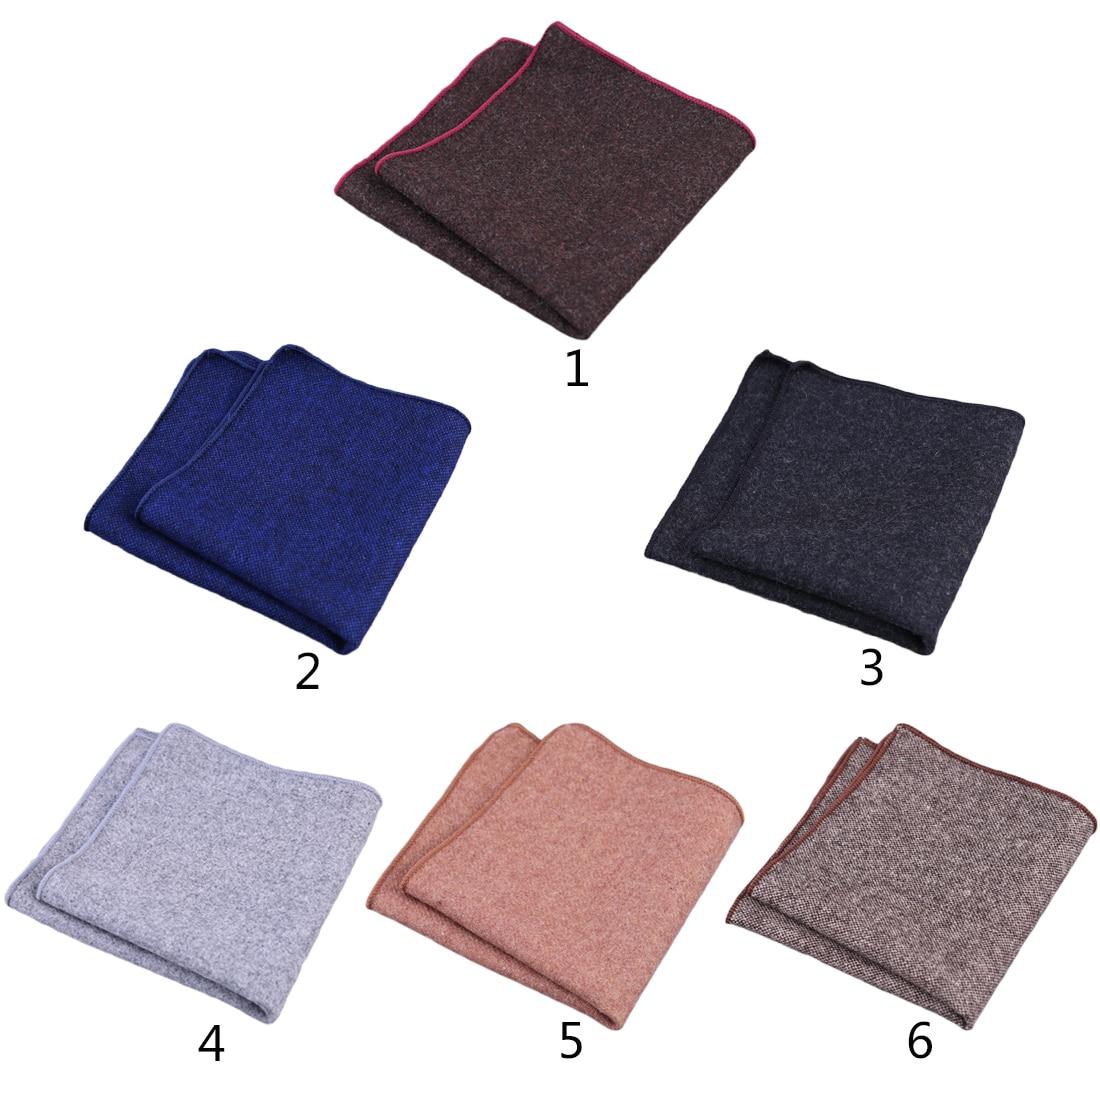 High Quality 23*23cm Hankerchief Vintage Suits Solid Pocket Wool Hankies Men's Pocket Square Handkerchiefs Striped Solid Cotton